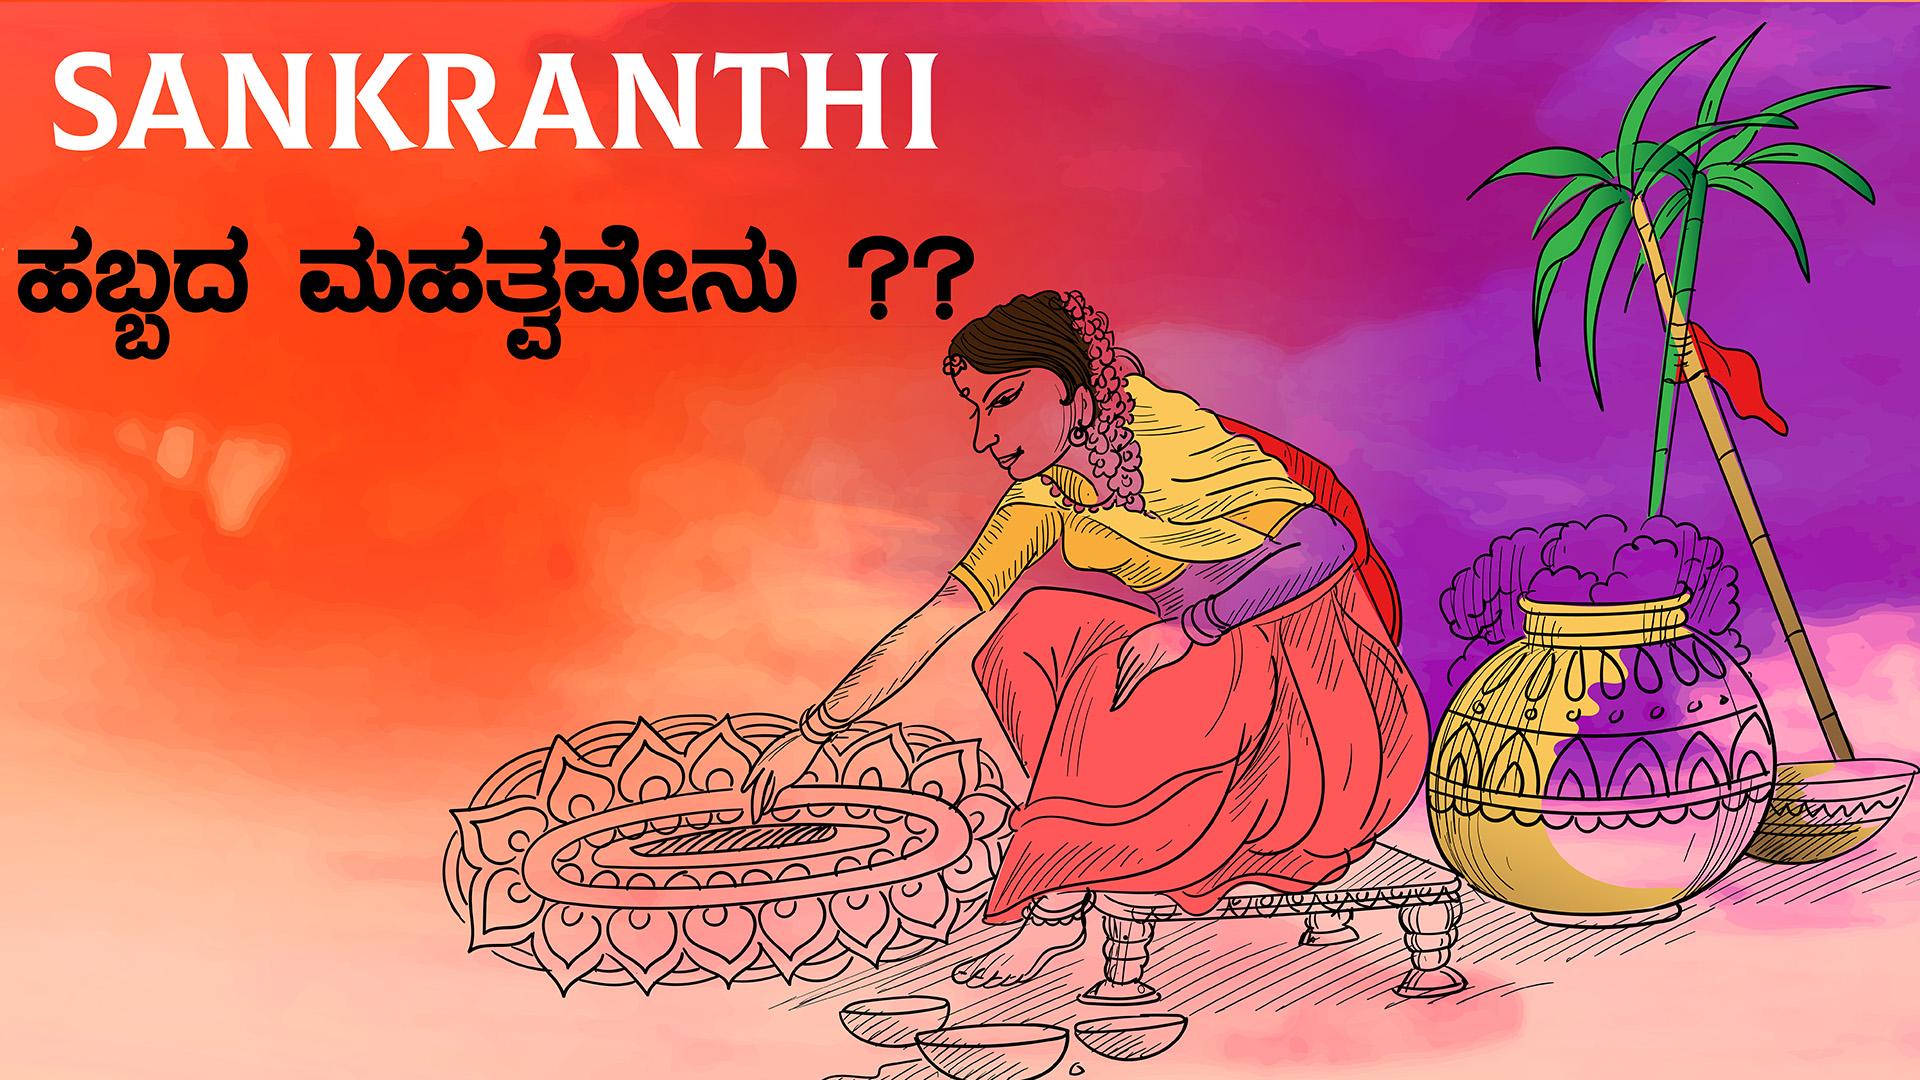 Makara Sankranthi ಬಗ್ಗೆ ನಿಮಗೆ ತಿಳಿಯಲೇ ಬೇಕಾದ ಮಾಹಿತಿ ಇದು !!  Oneindia Kannada